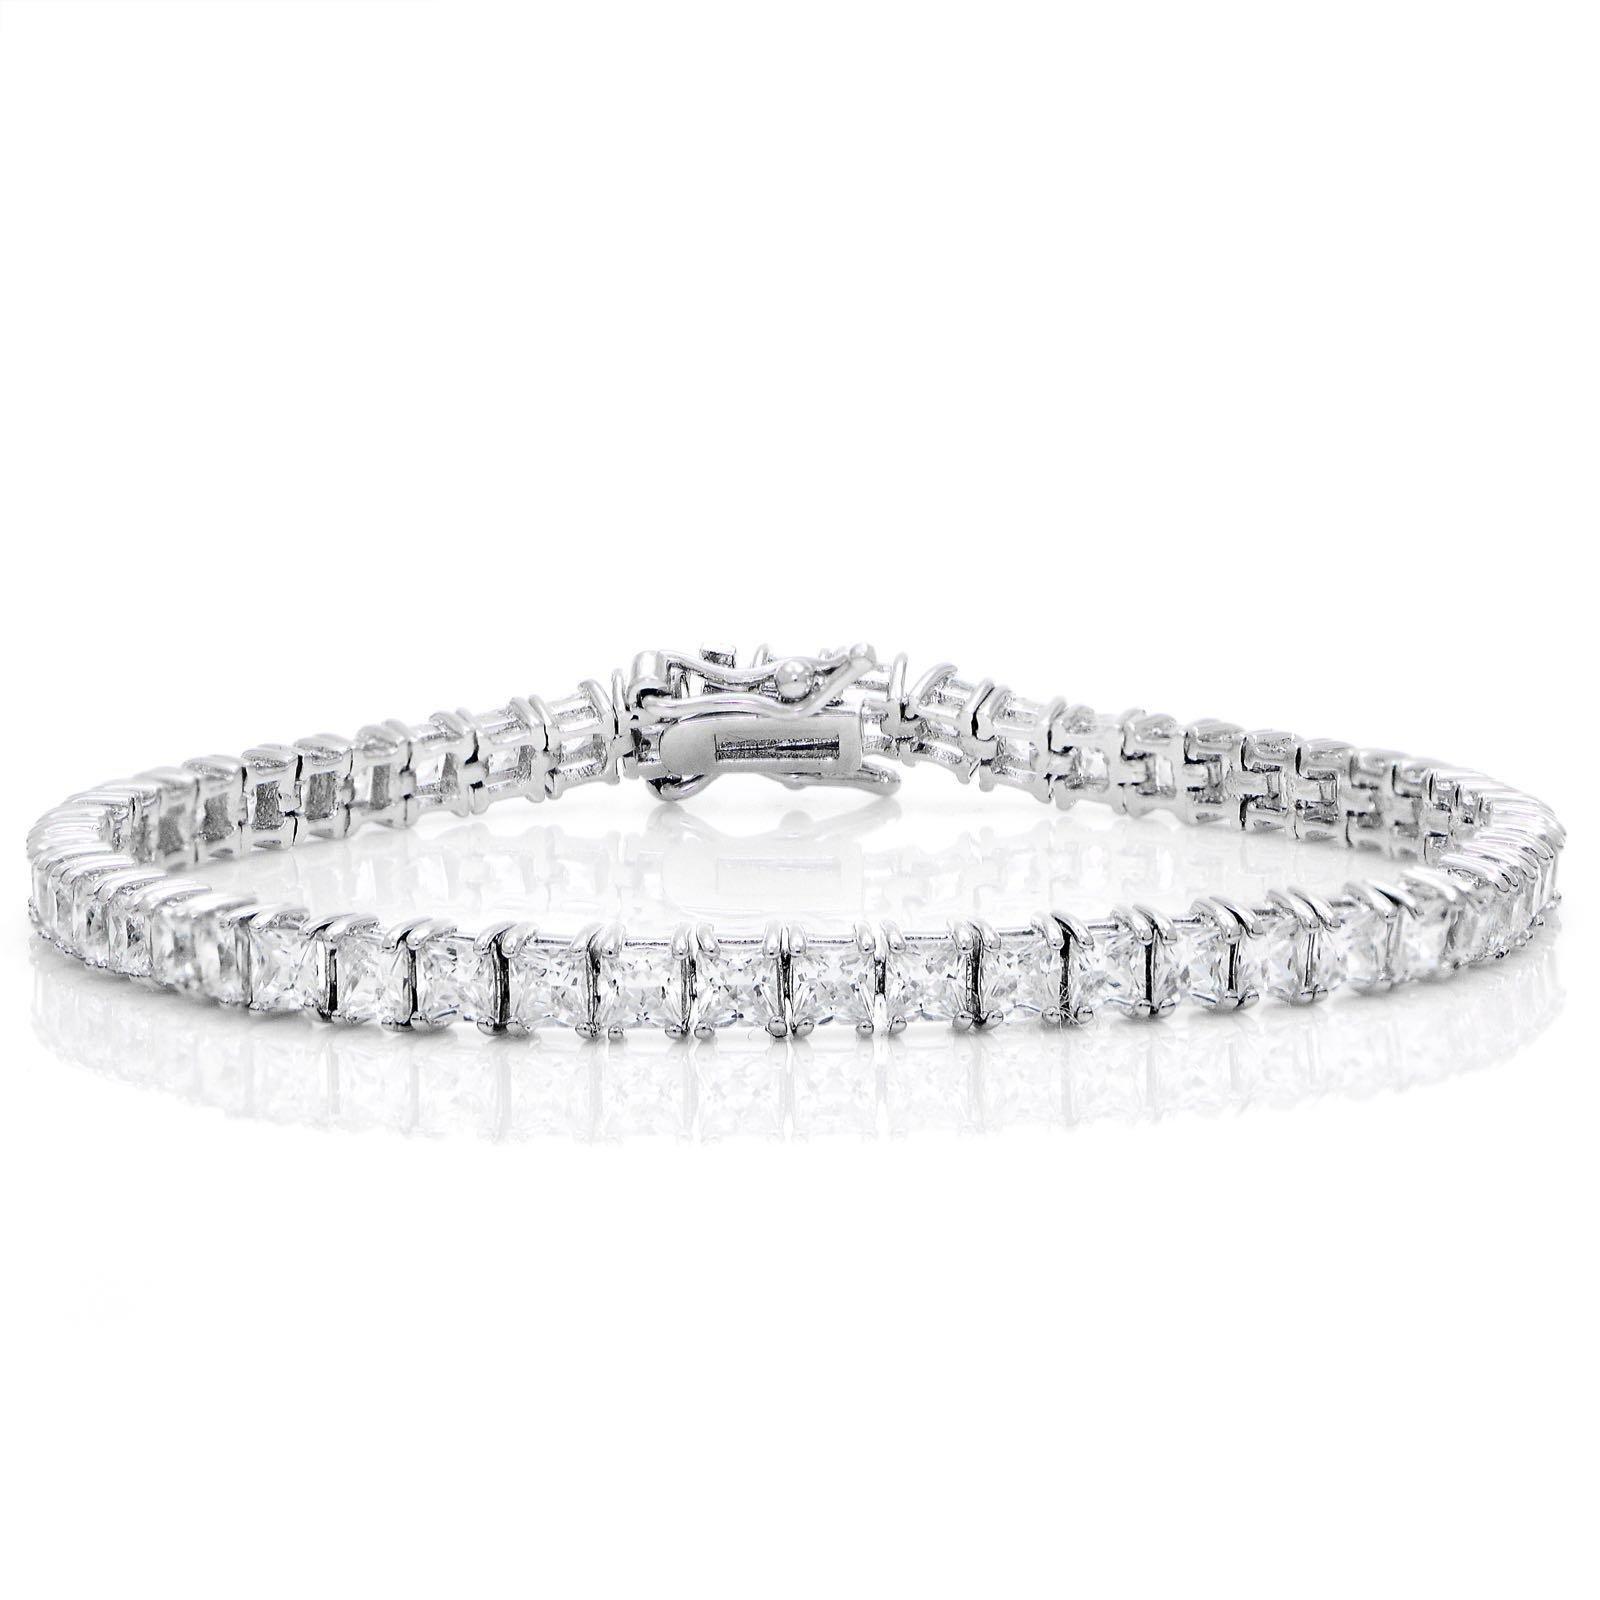 GemStar USA Princess-cut Sparkling 3x3mm Cubic Zirconia Classic Tennis Bracelet